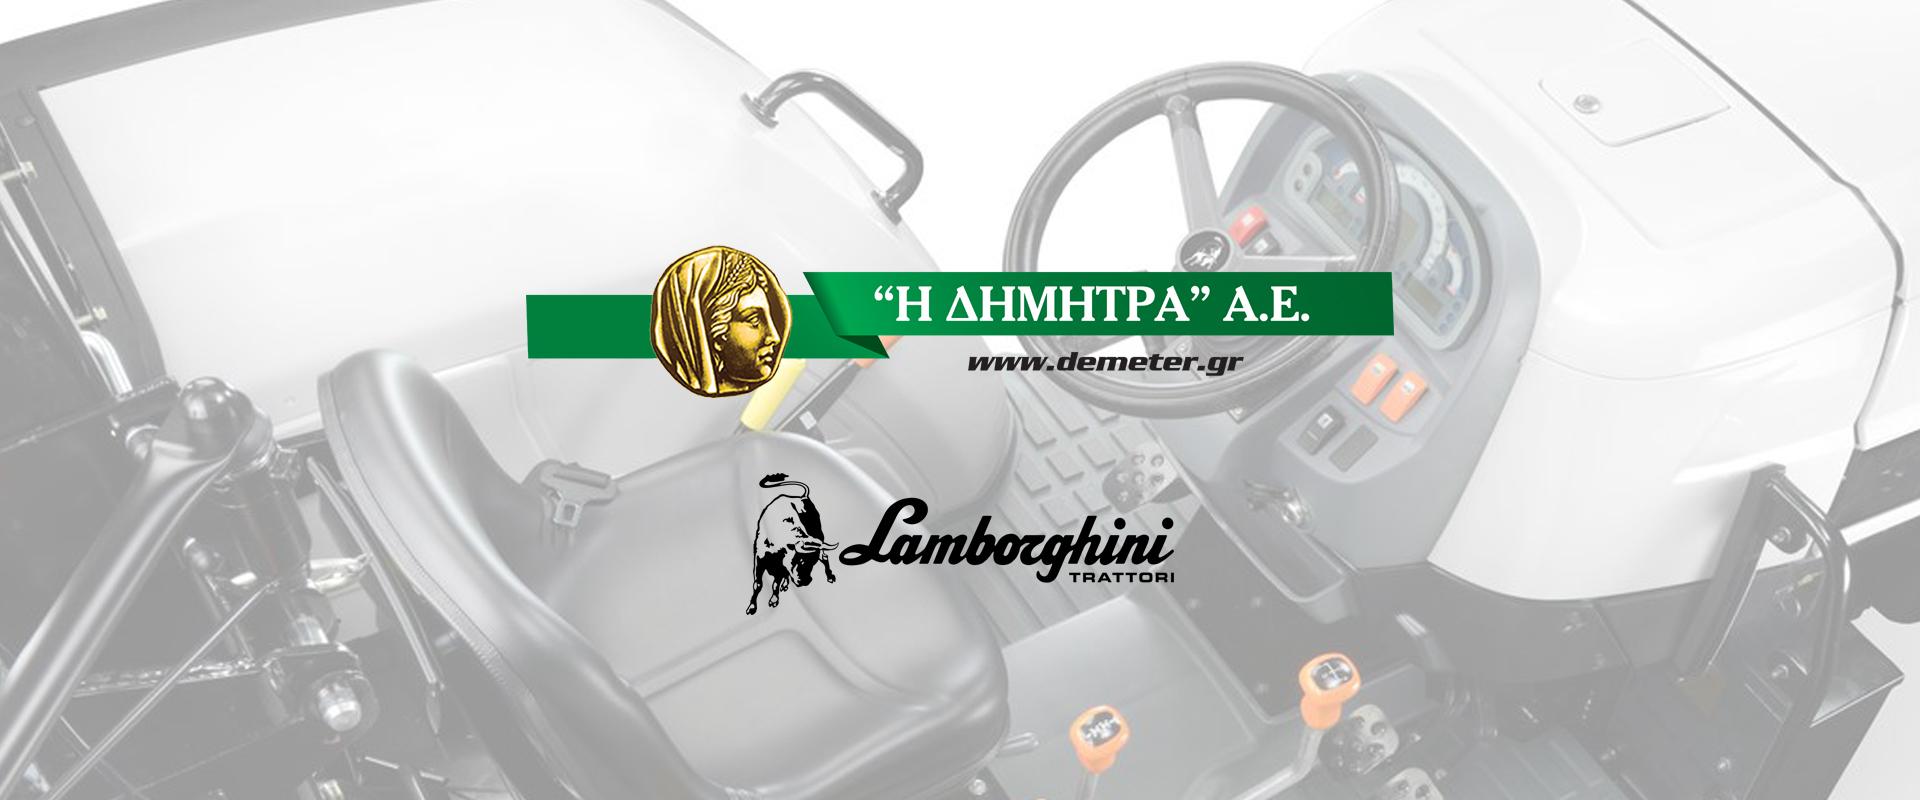 demeter-lamborghini-trattori-trakter-promo-corporate-video